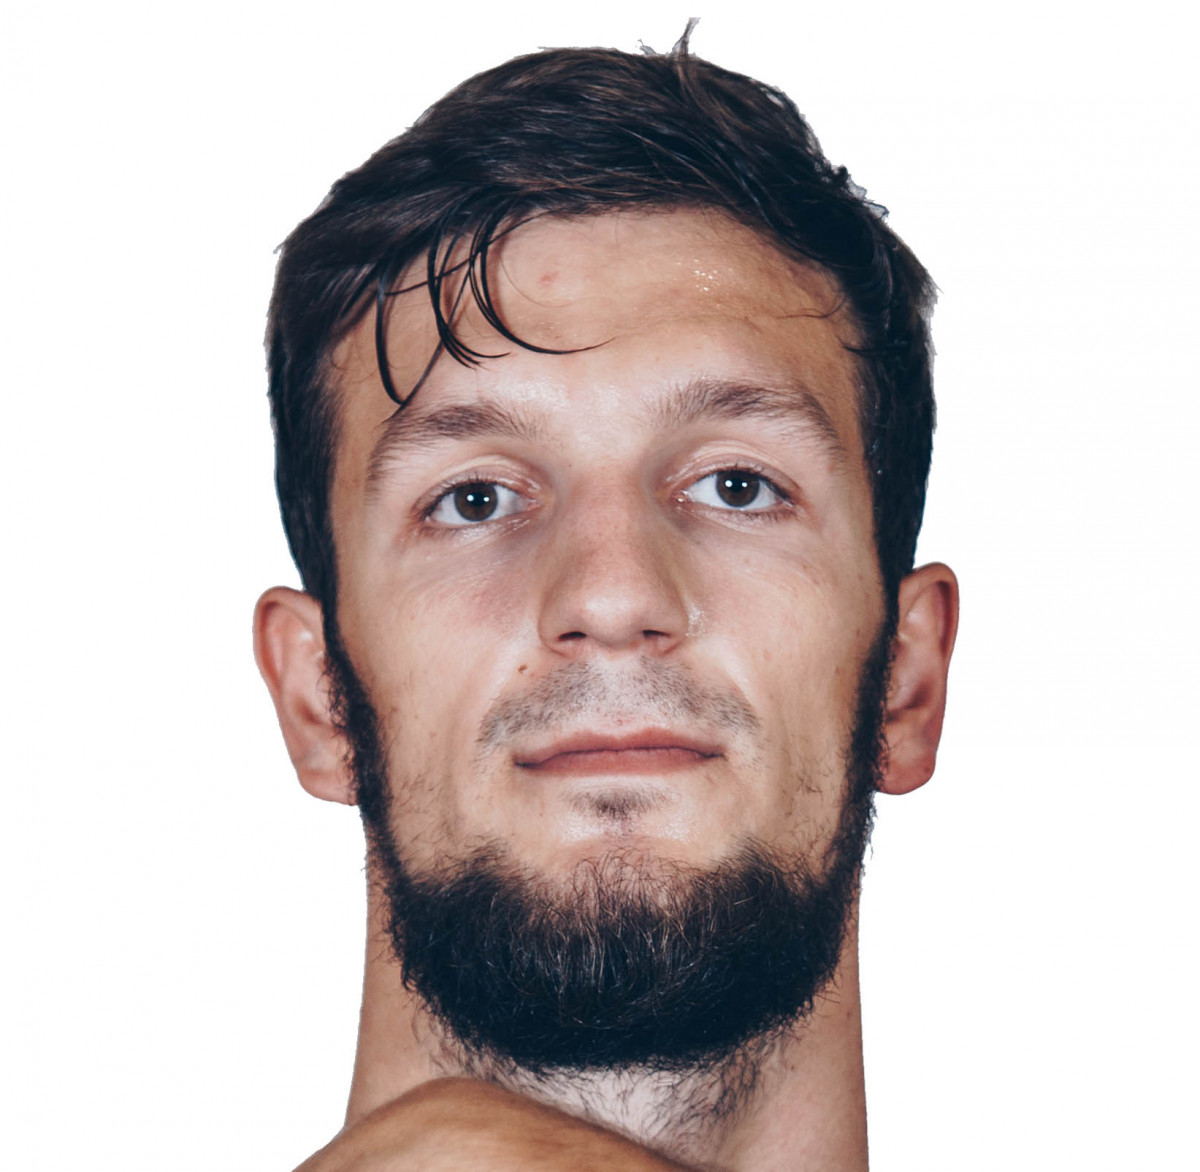 Marcin Piechowicz